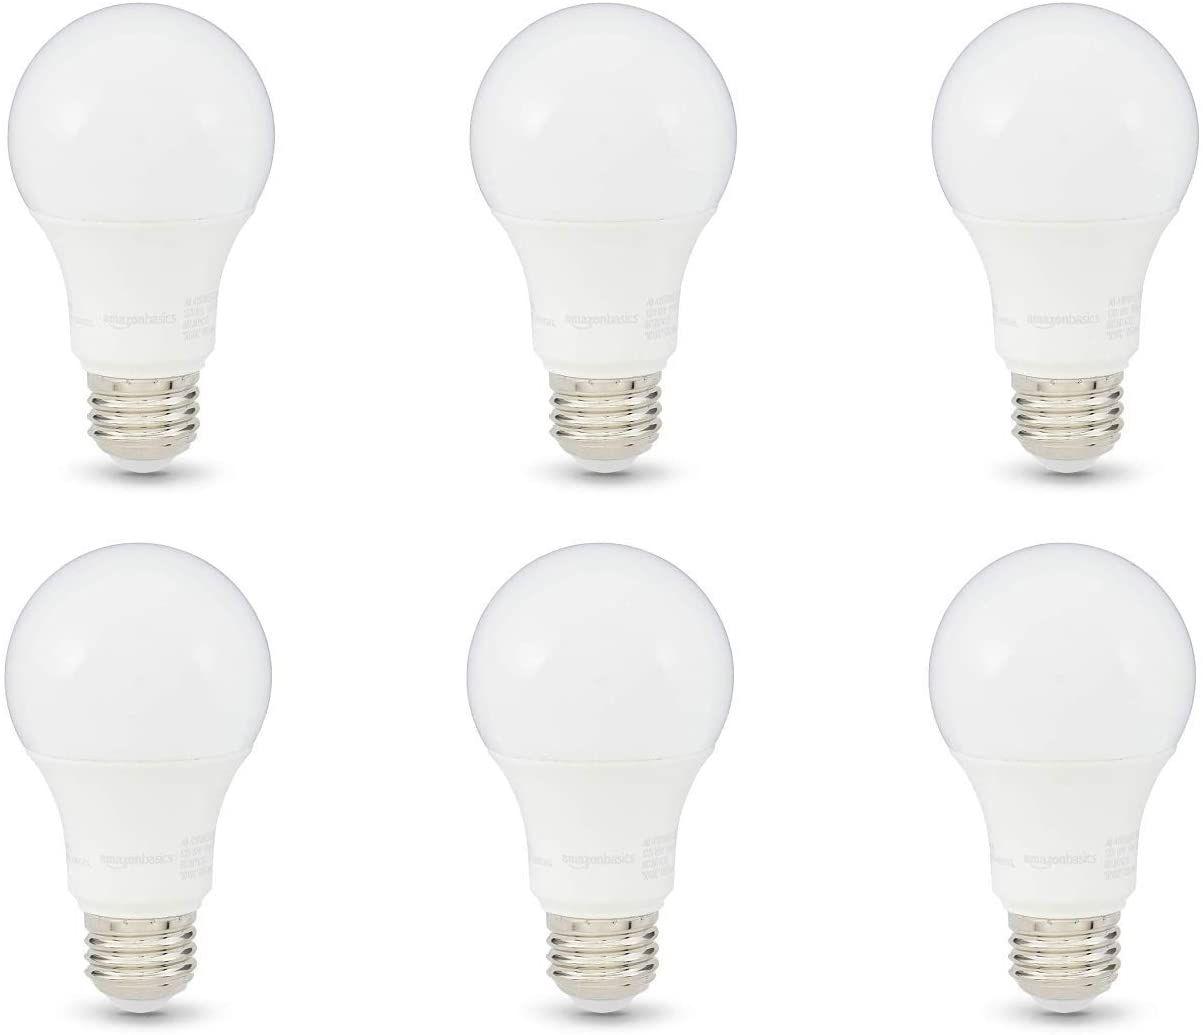 75-Watt-Equivalent Dimmable LED Light Bulbs